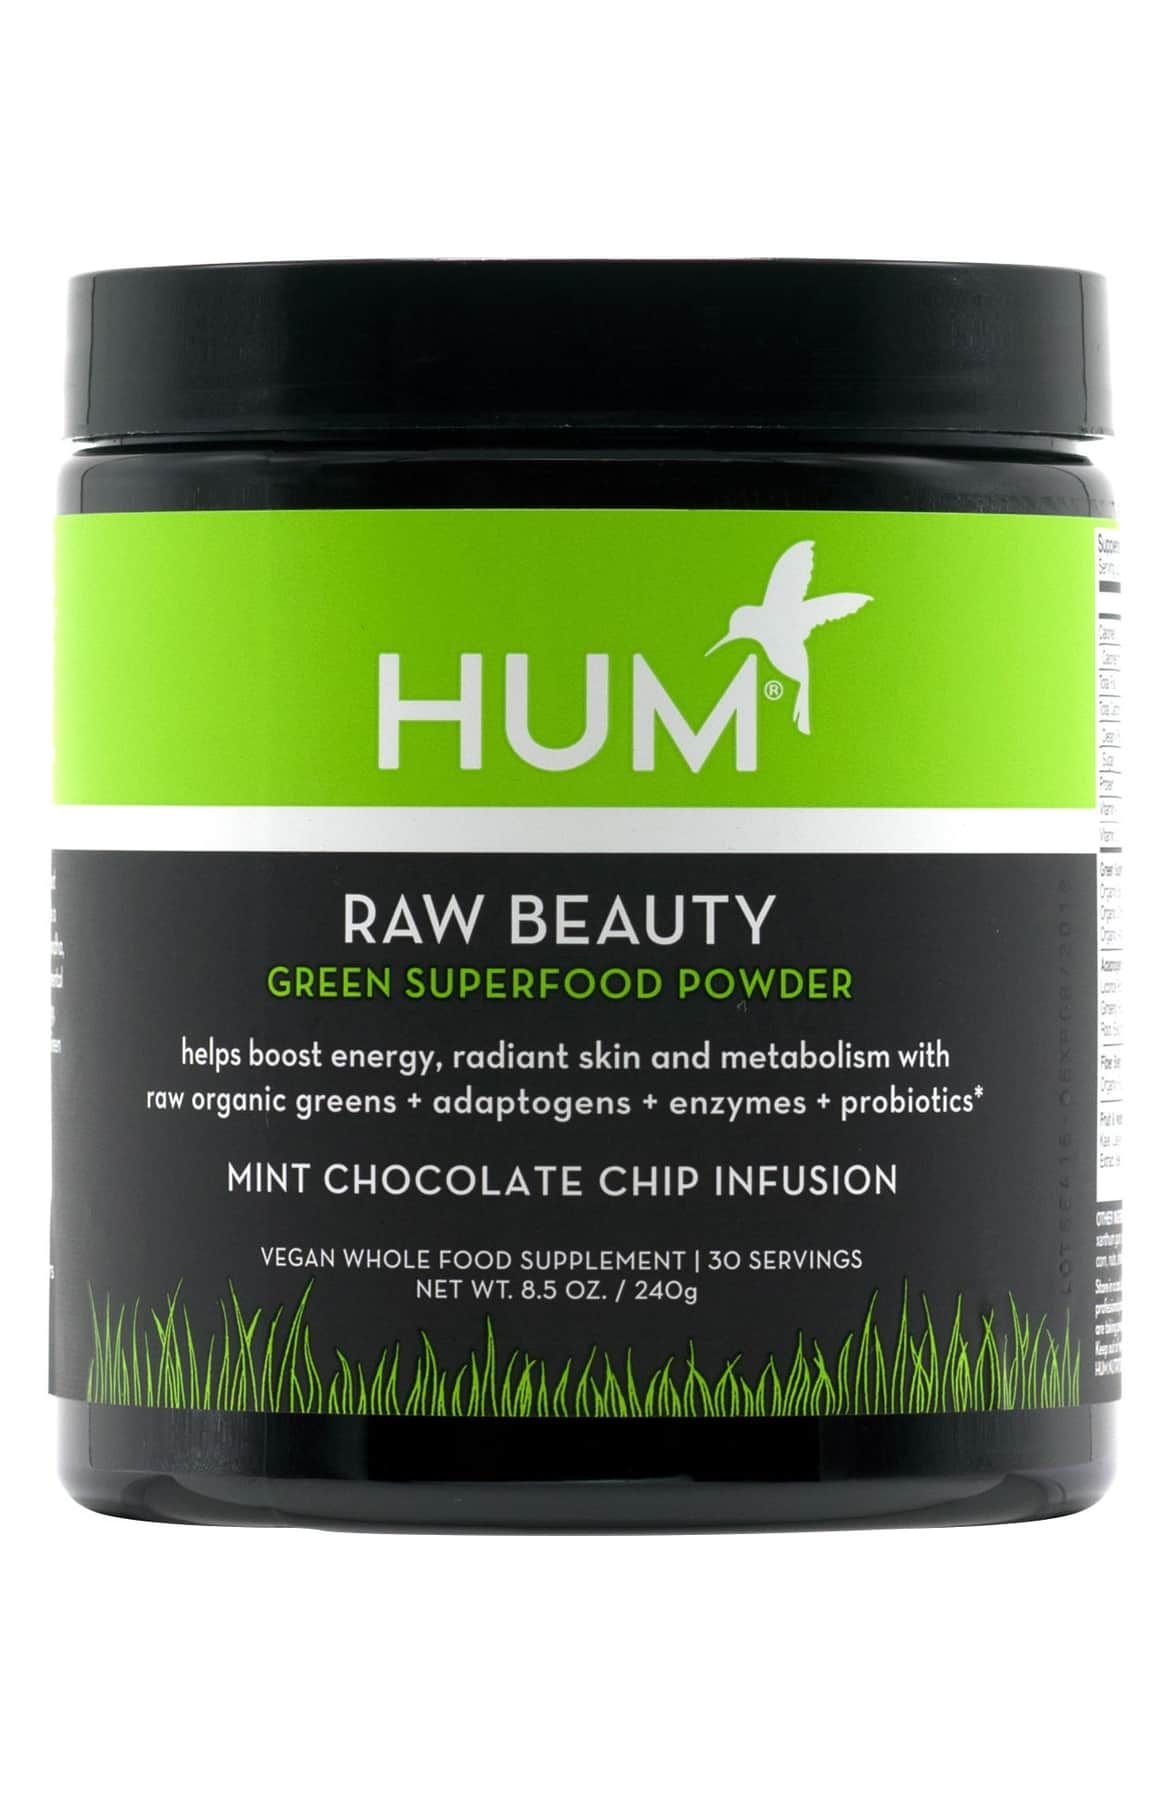 Hum Nutrition Raw Beauty Skin Energy Green Superfood Powder Green Superfood Powder